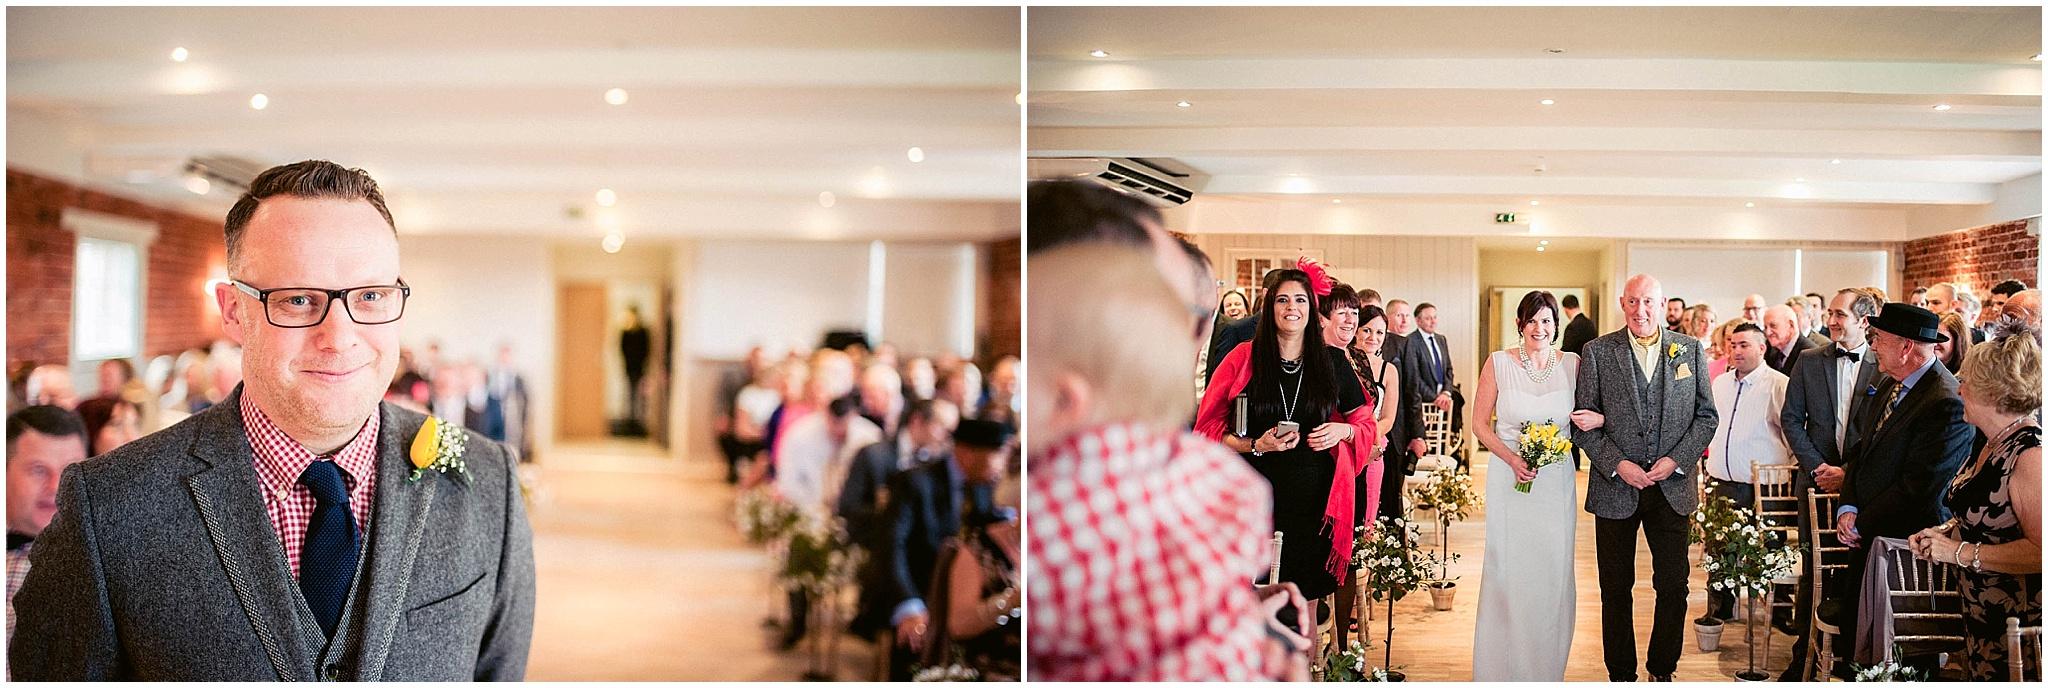 sopley mill wedding photography10